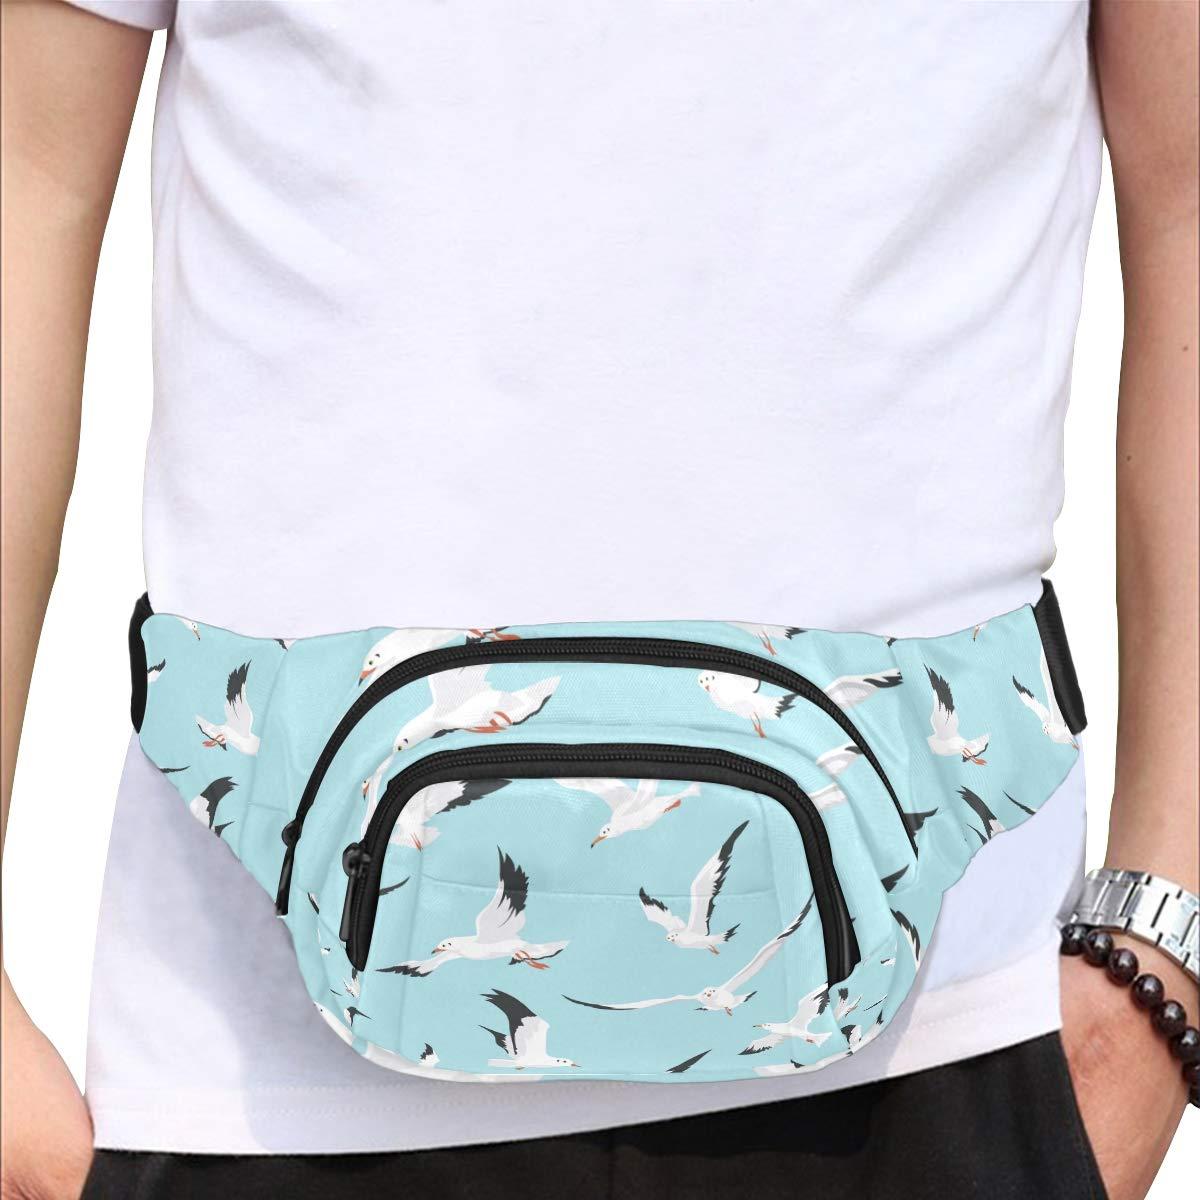 Nautical Birds Marine Seagulls Fenny Packs Waist Bags Adjustable Belt Waterproof Nylon Travel Running Sport Vacation Party For Men Women Boys Girls Kids